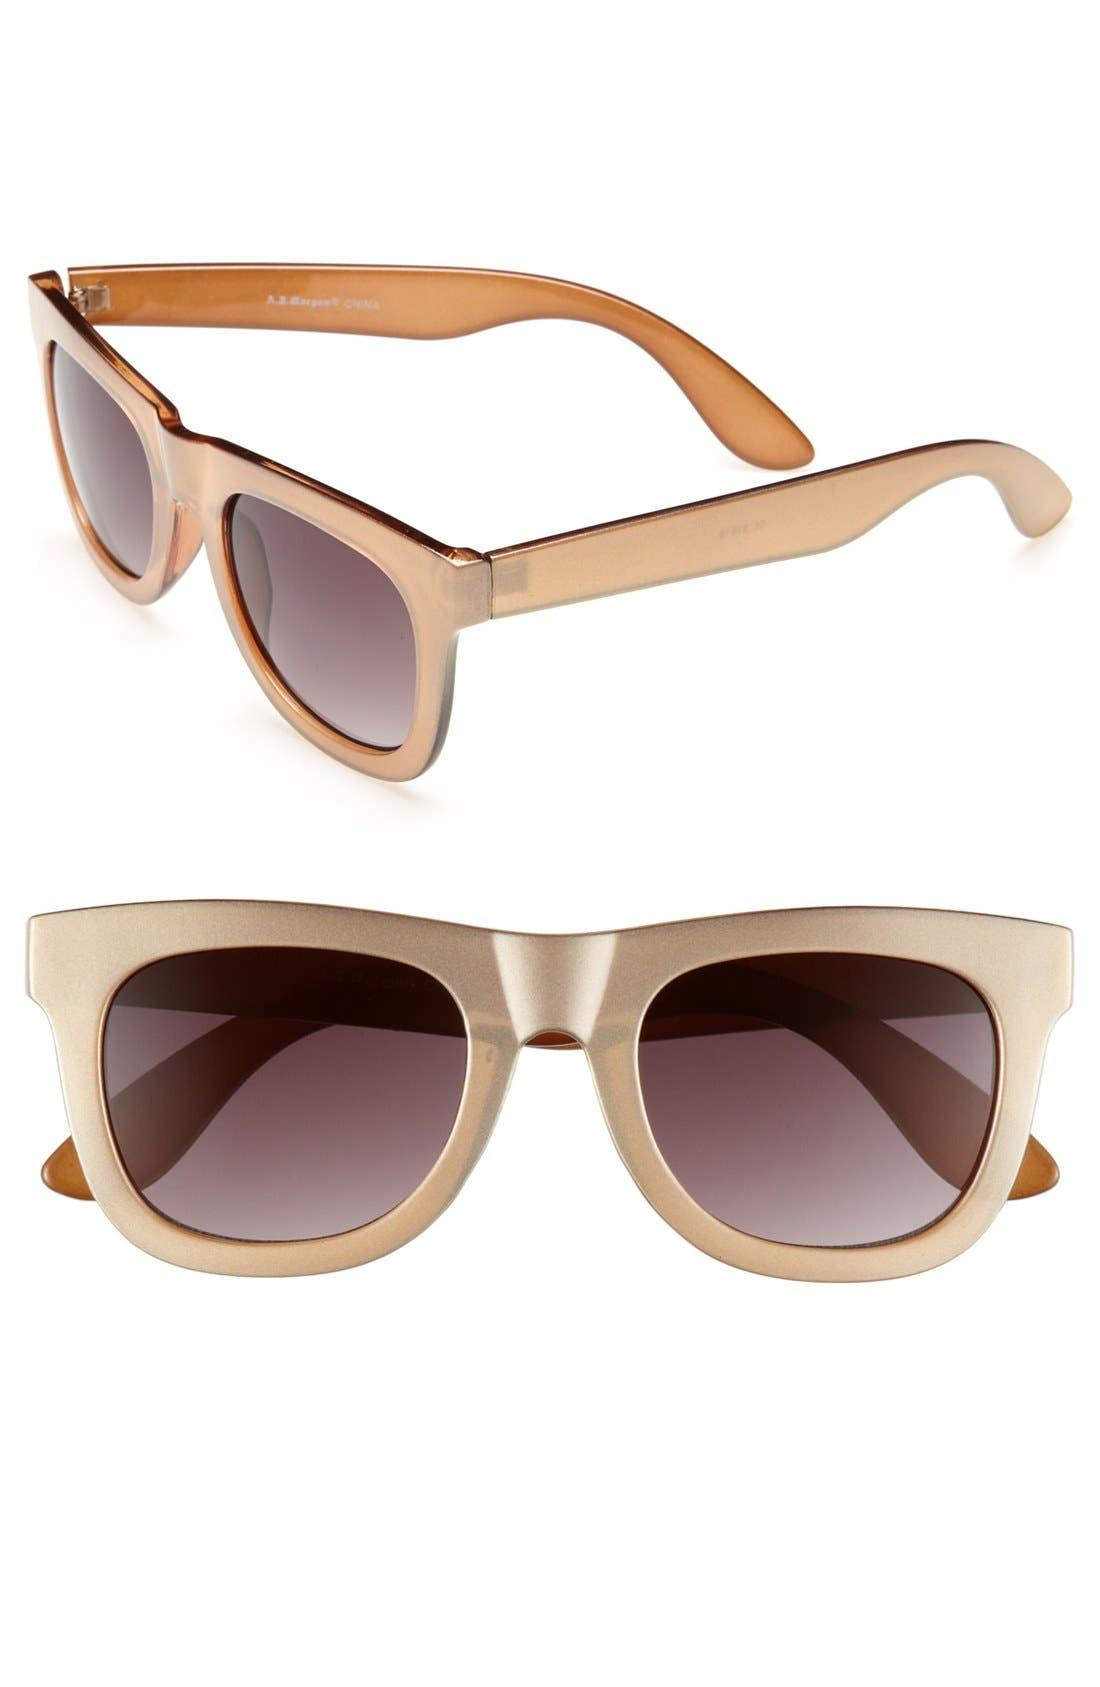 Alternate Image 1 Selected - A.J. Morgan 'Glitz' Sunglasses